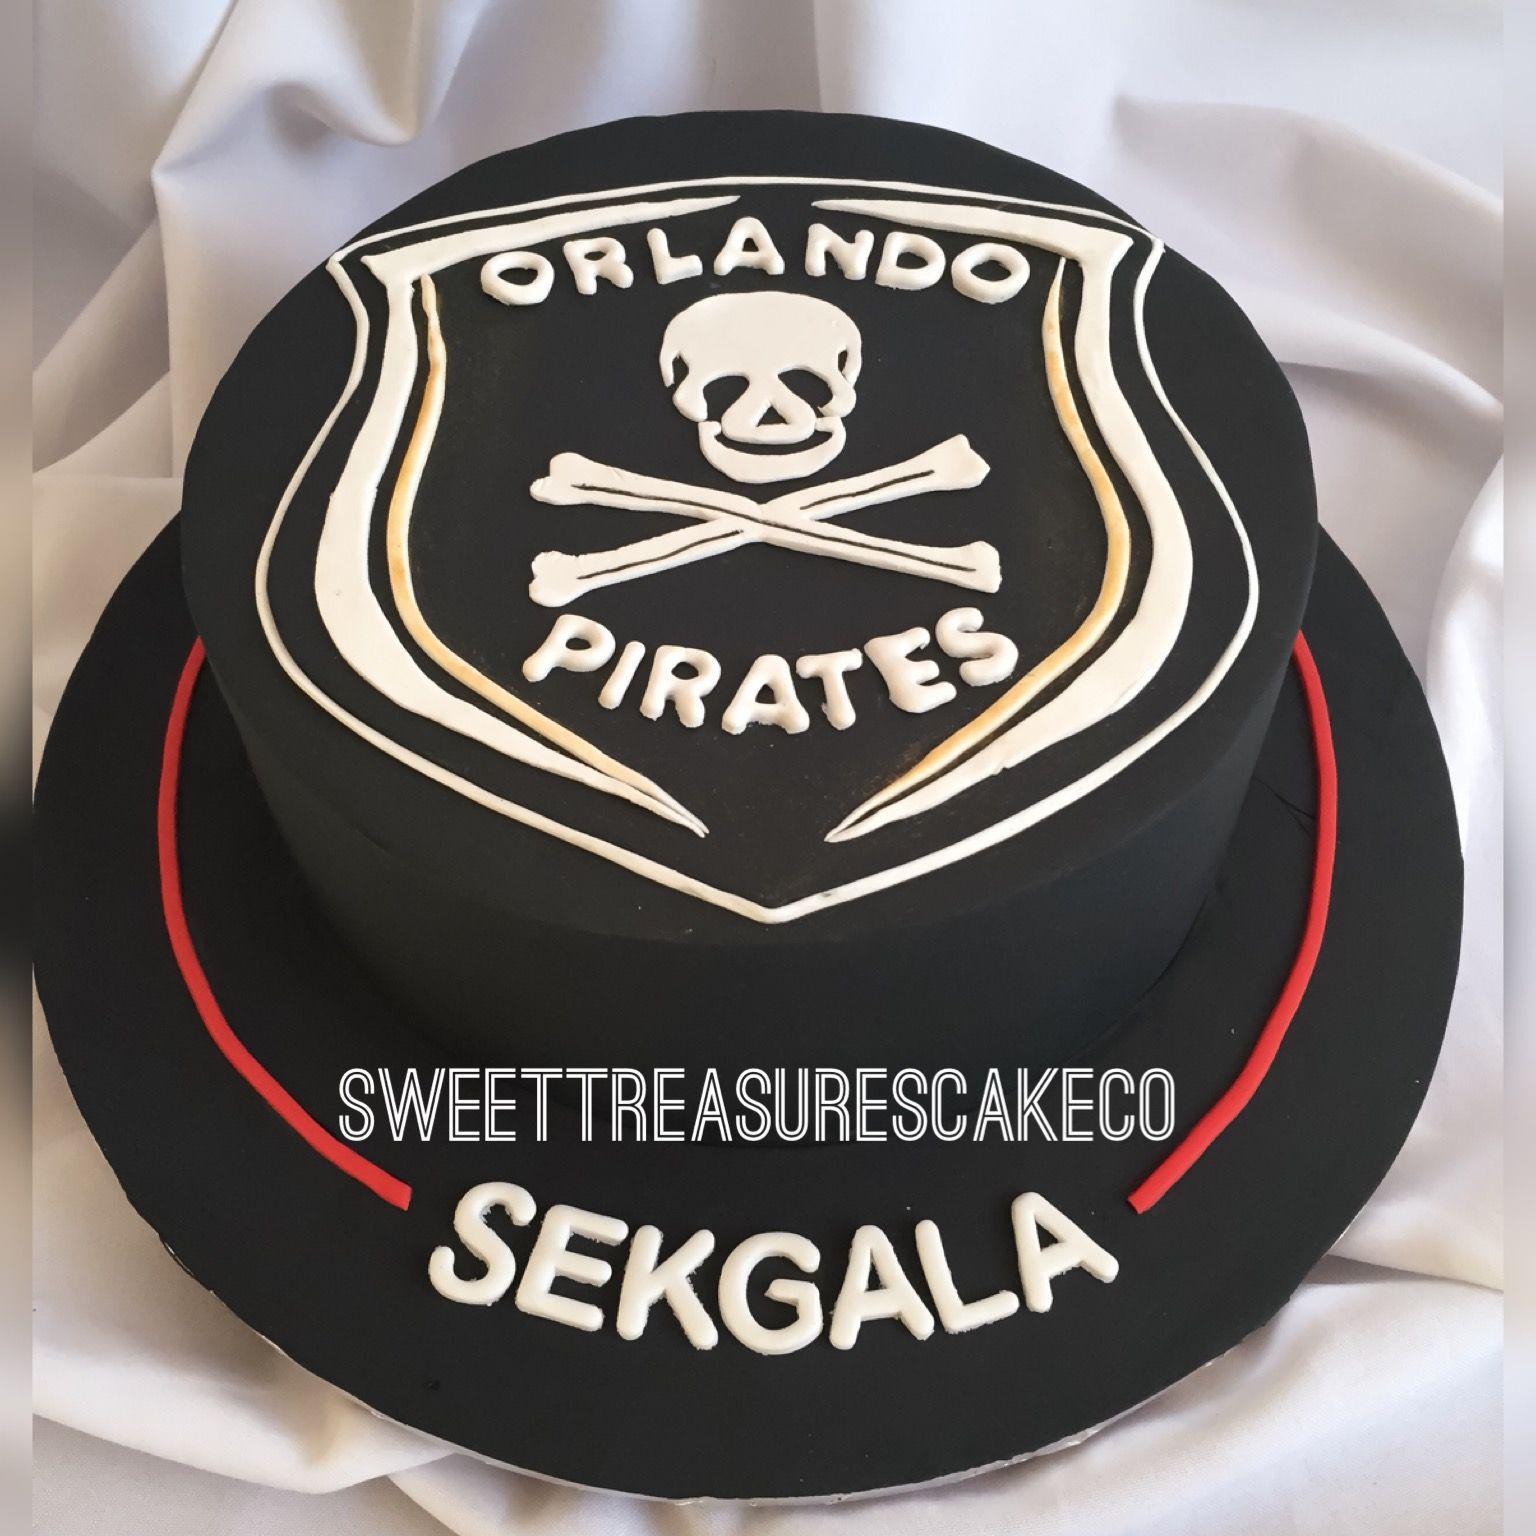 Pleasant Amabhakabhaka Made This Orlando Pirates Cake To Funny Birthday Cards Online Elaedamsfinfo